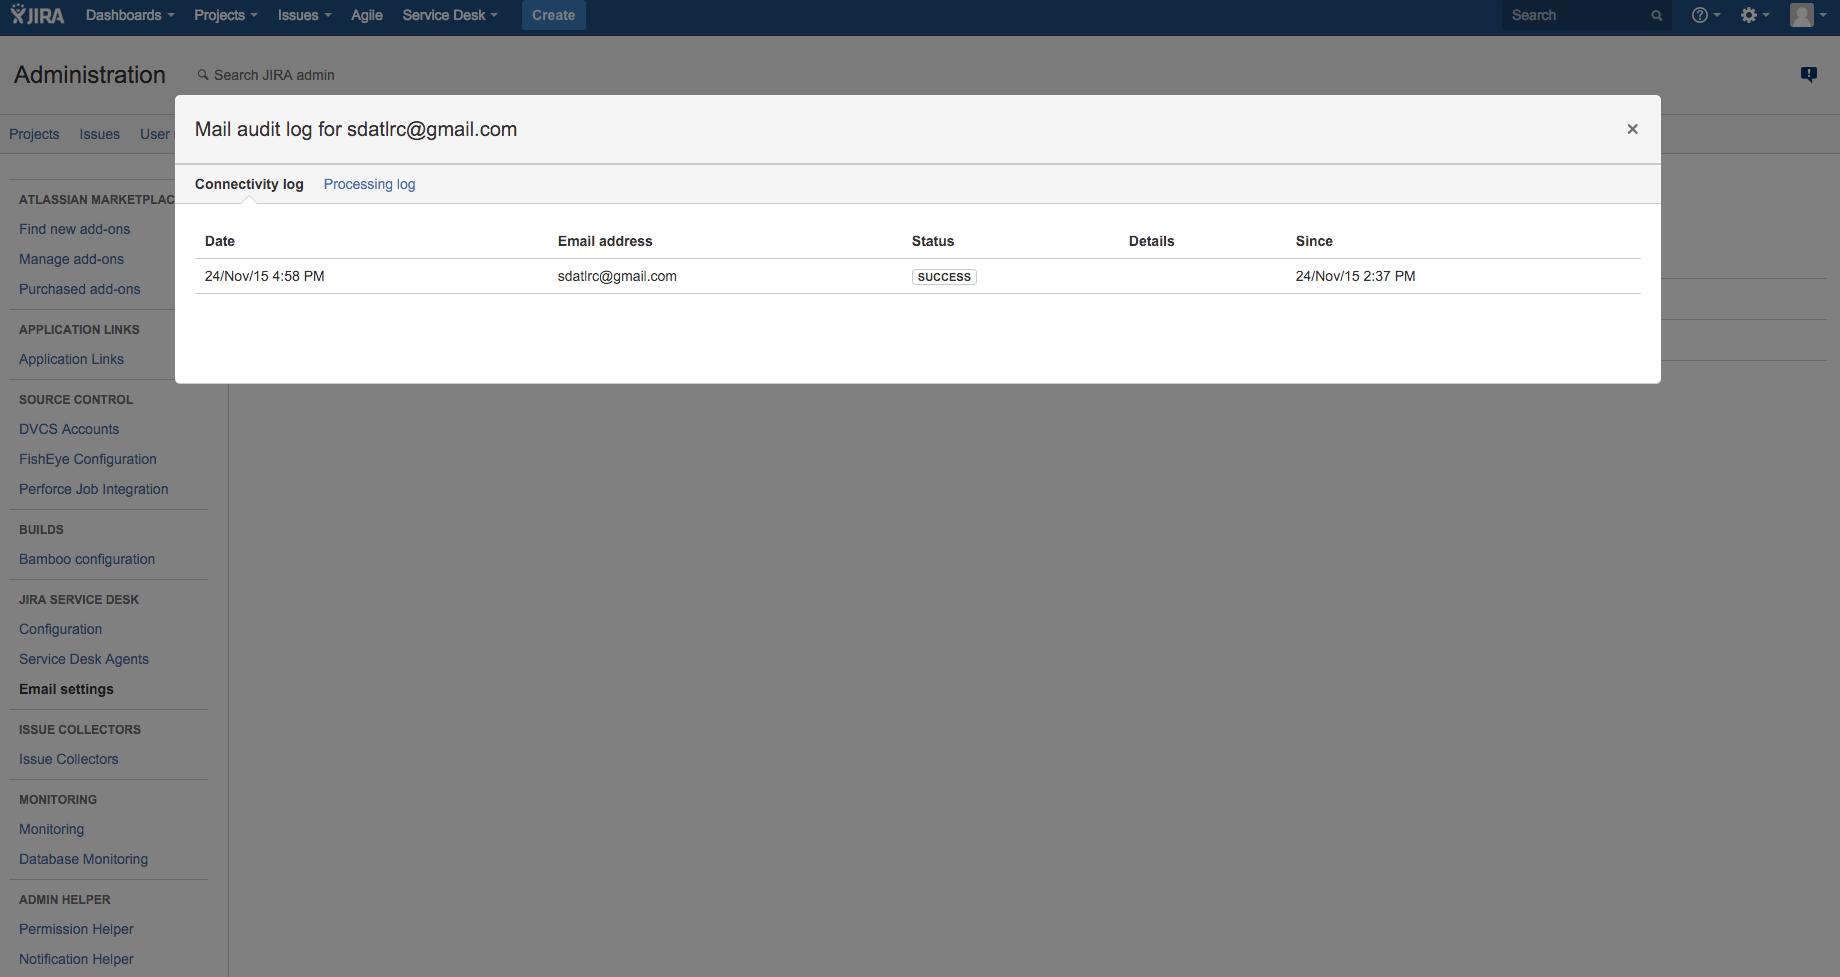 Troubleshooting JIRA Service Desk Incoming Mail - Atlassian